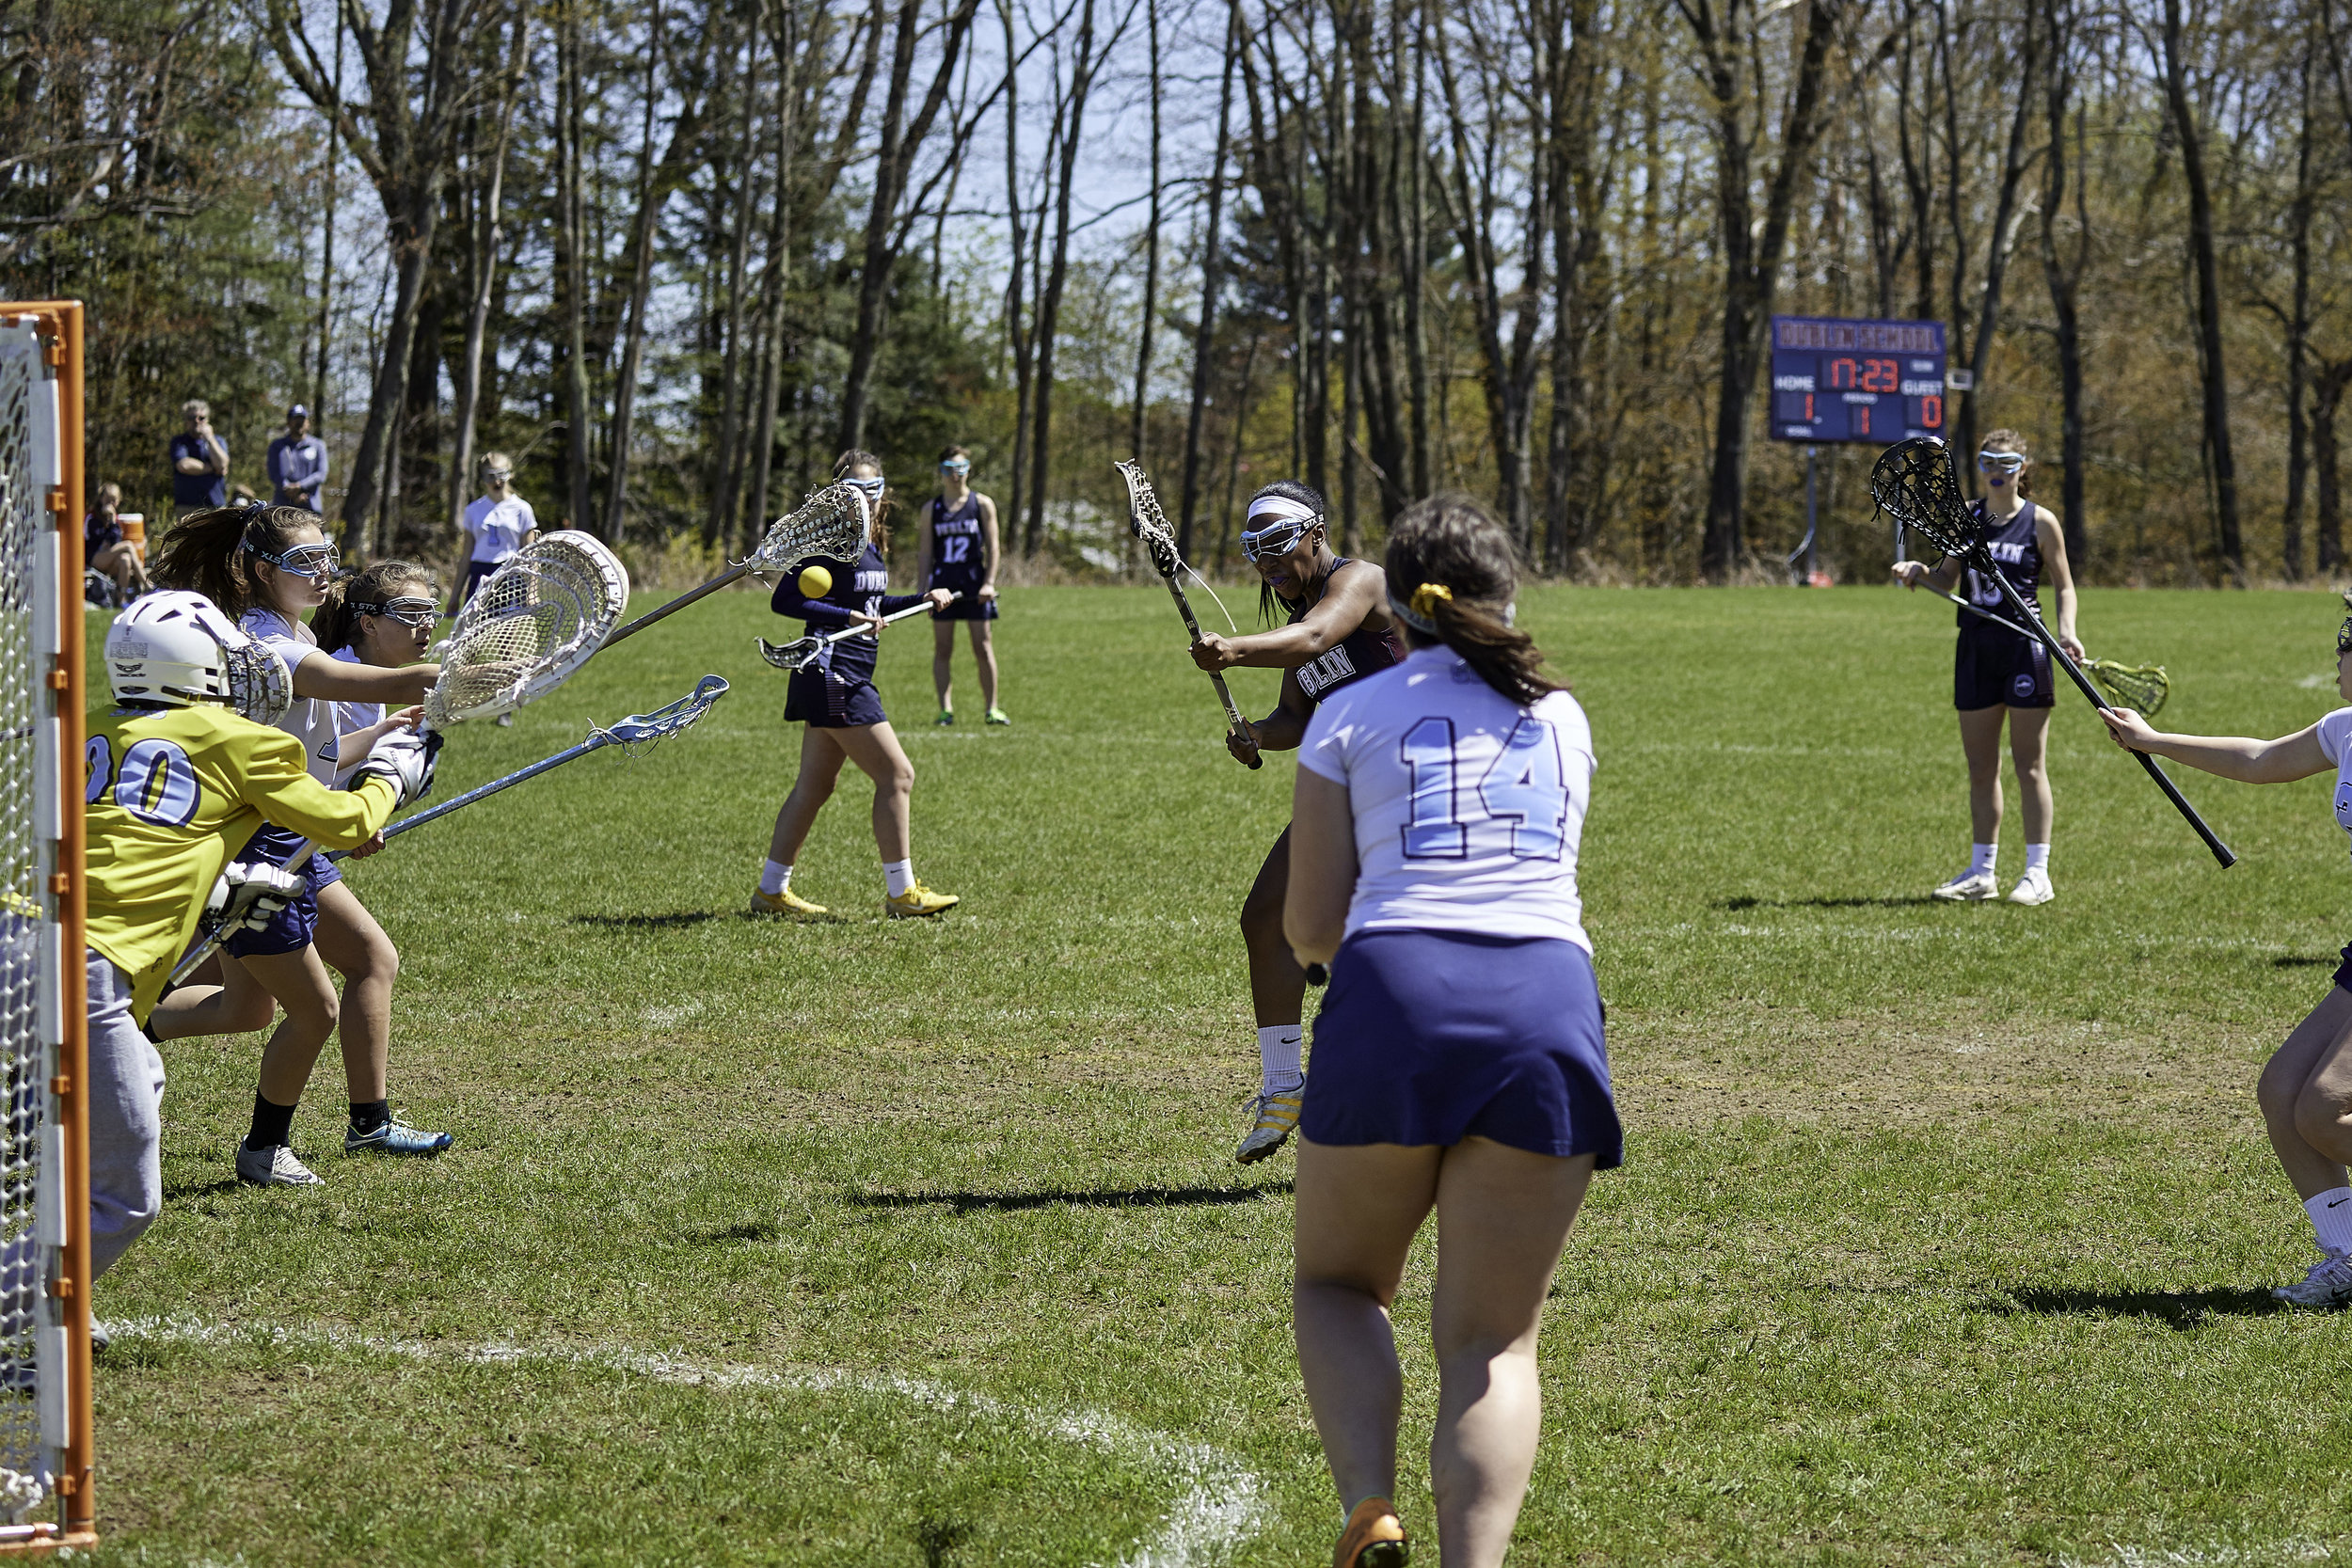 Girls Lacrosse vs. Stoneleigh Burnham School - May 11, 2019 - May 10, 2019193130.jpg